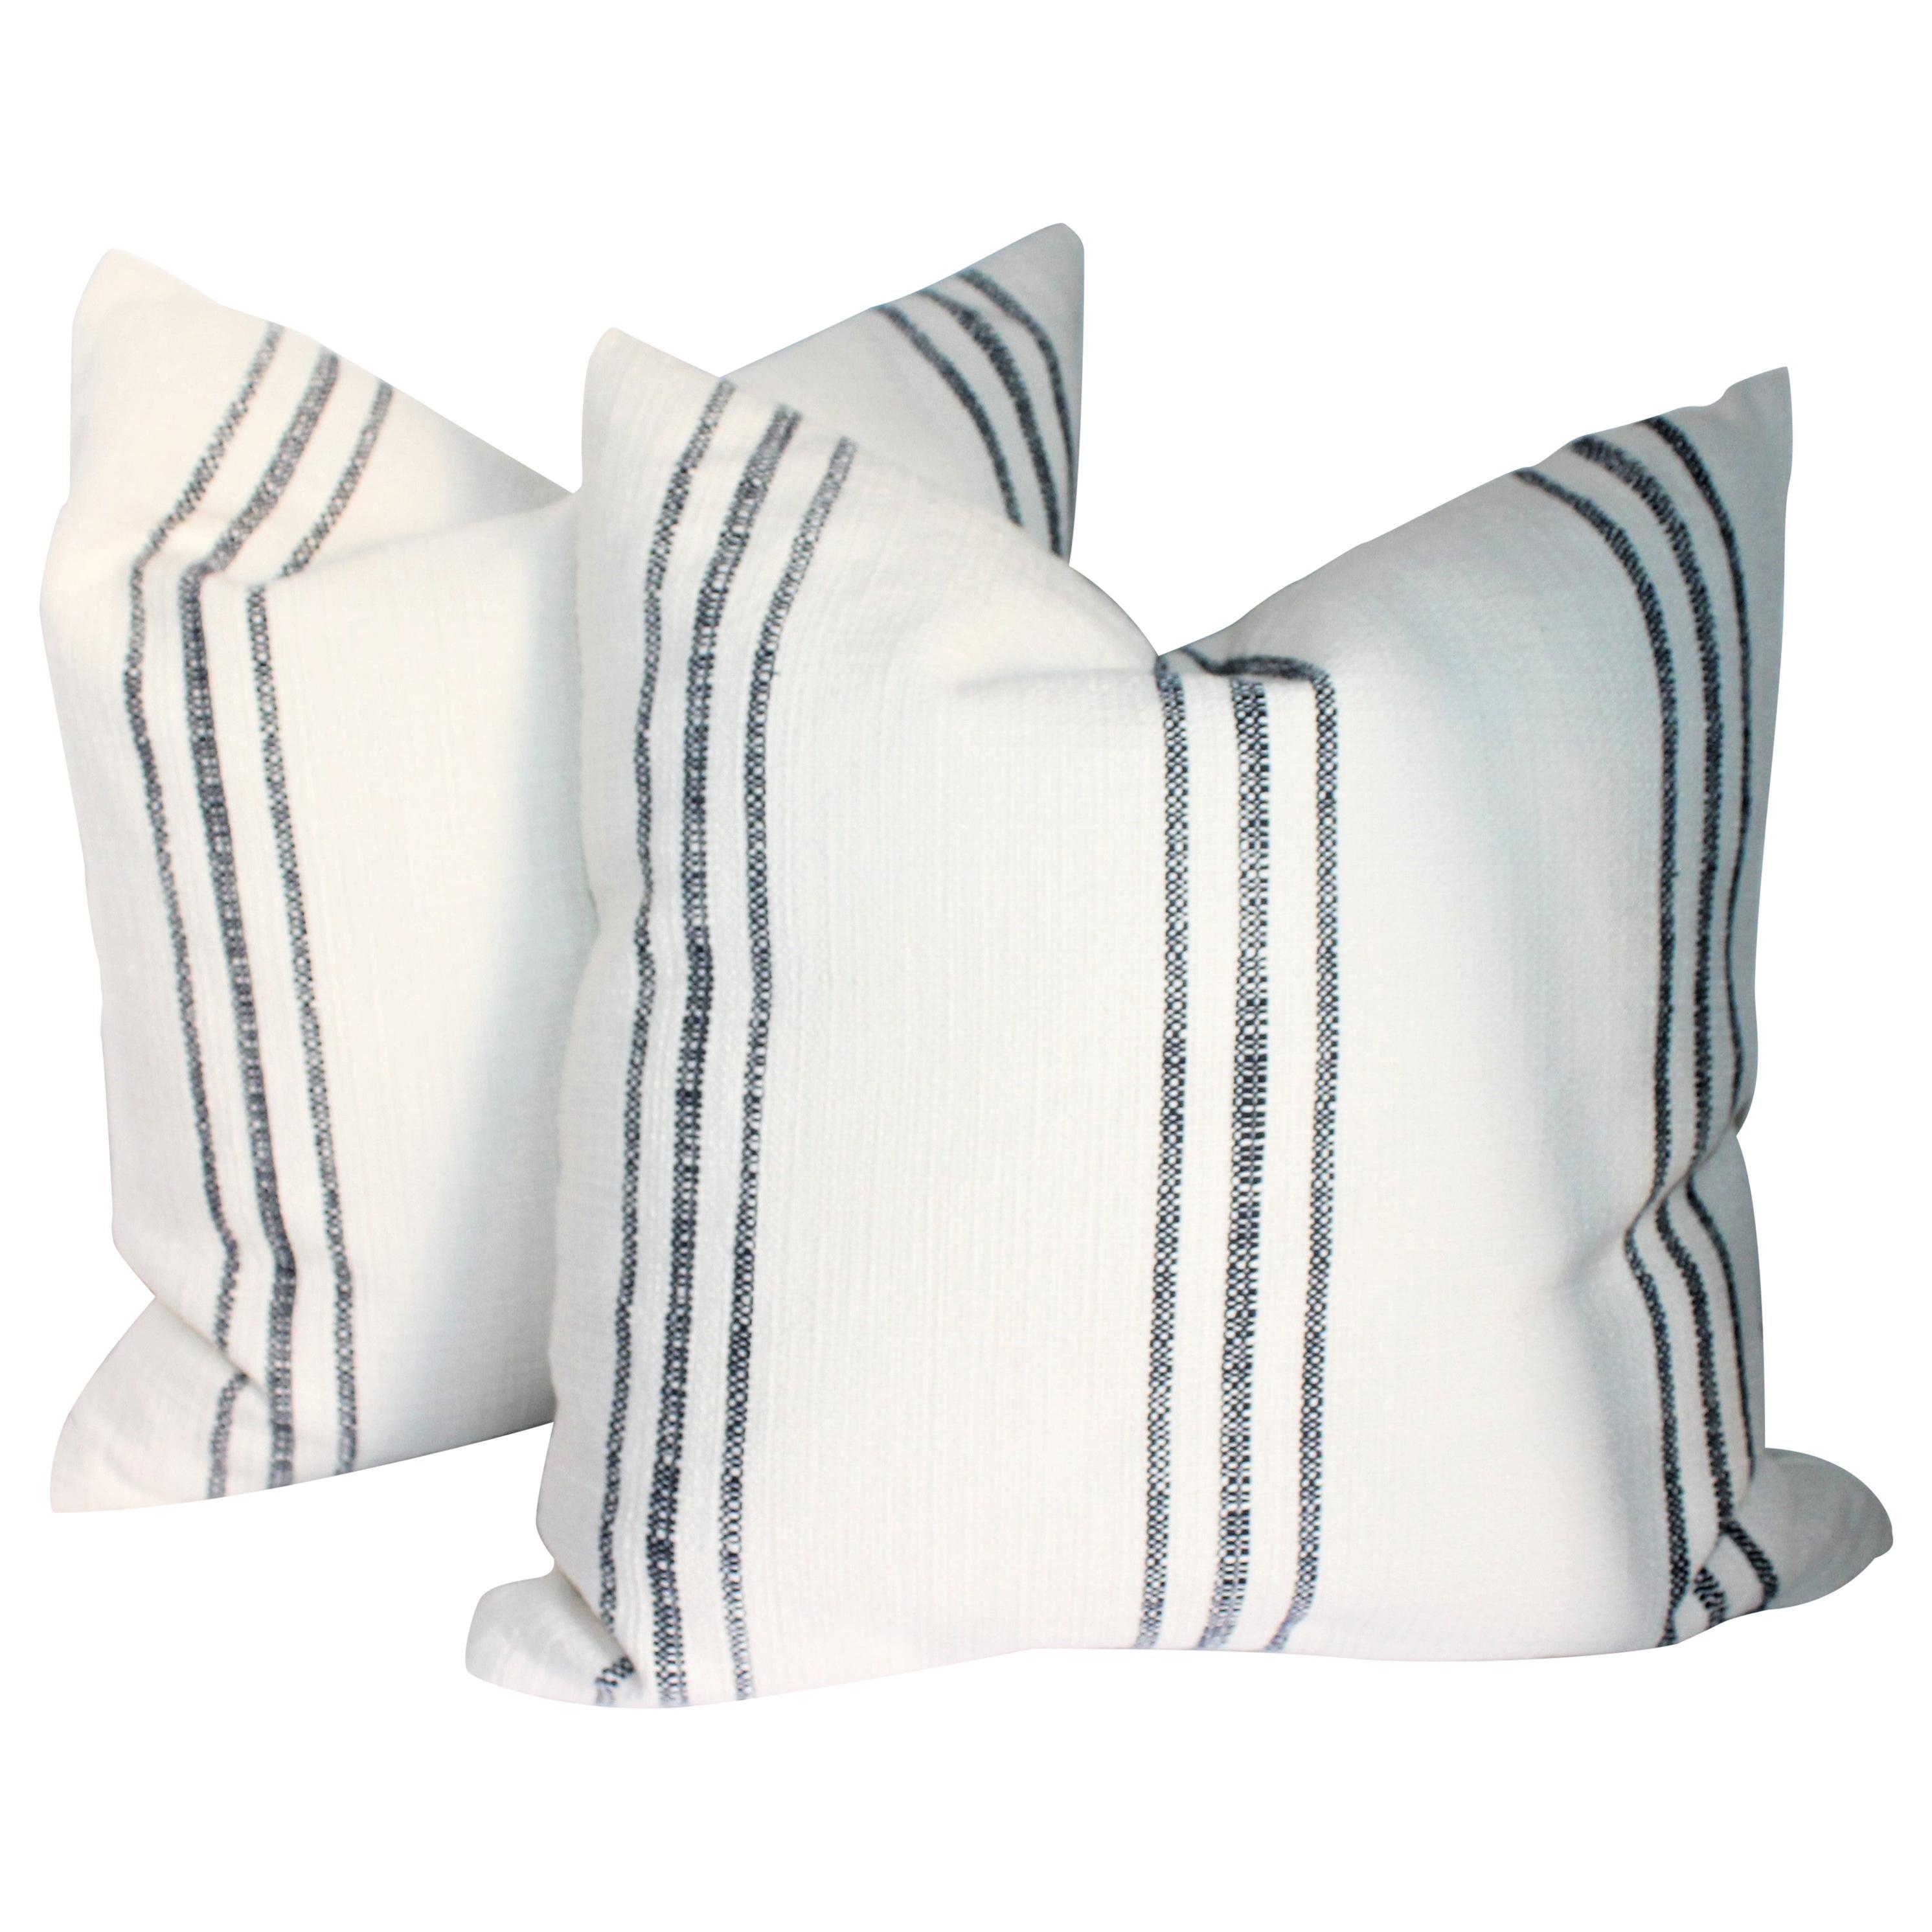 Vintage Homespun Linen Ticking Pillows / Pair